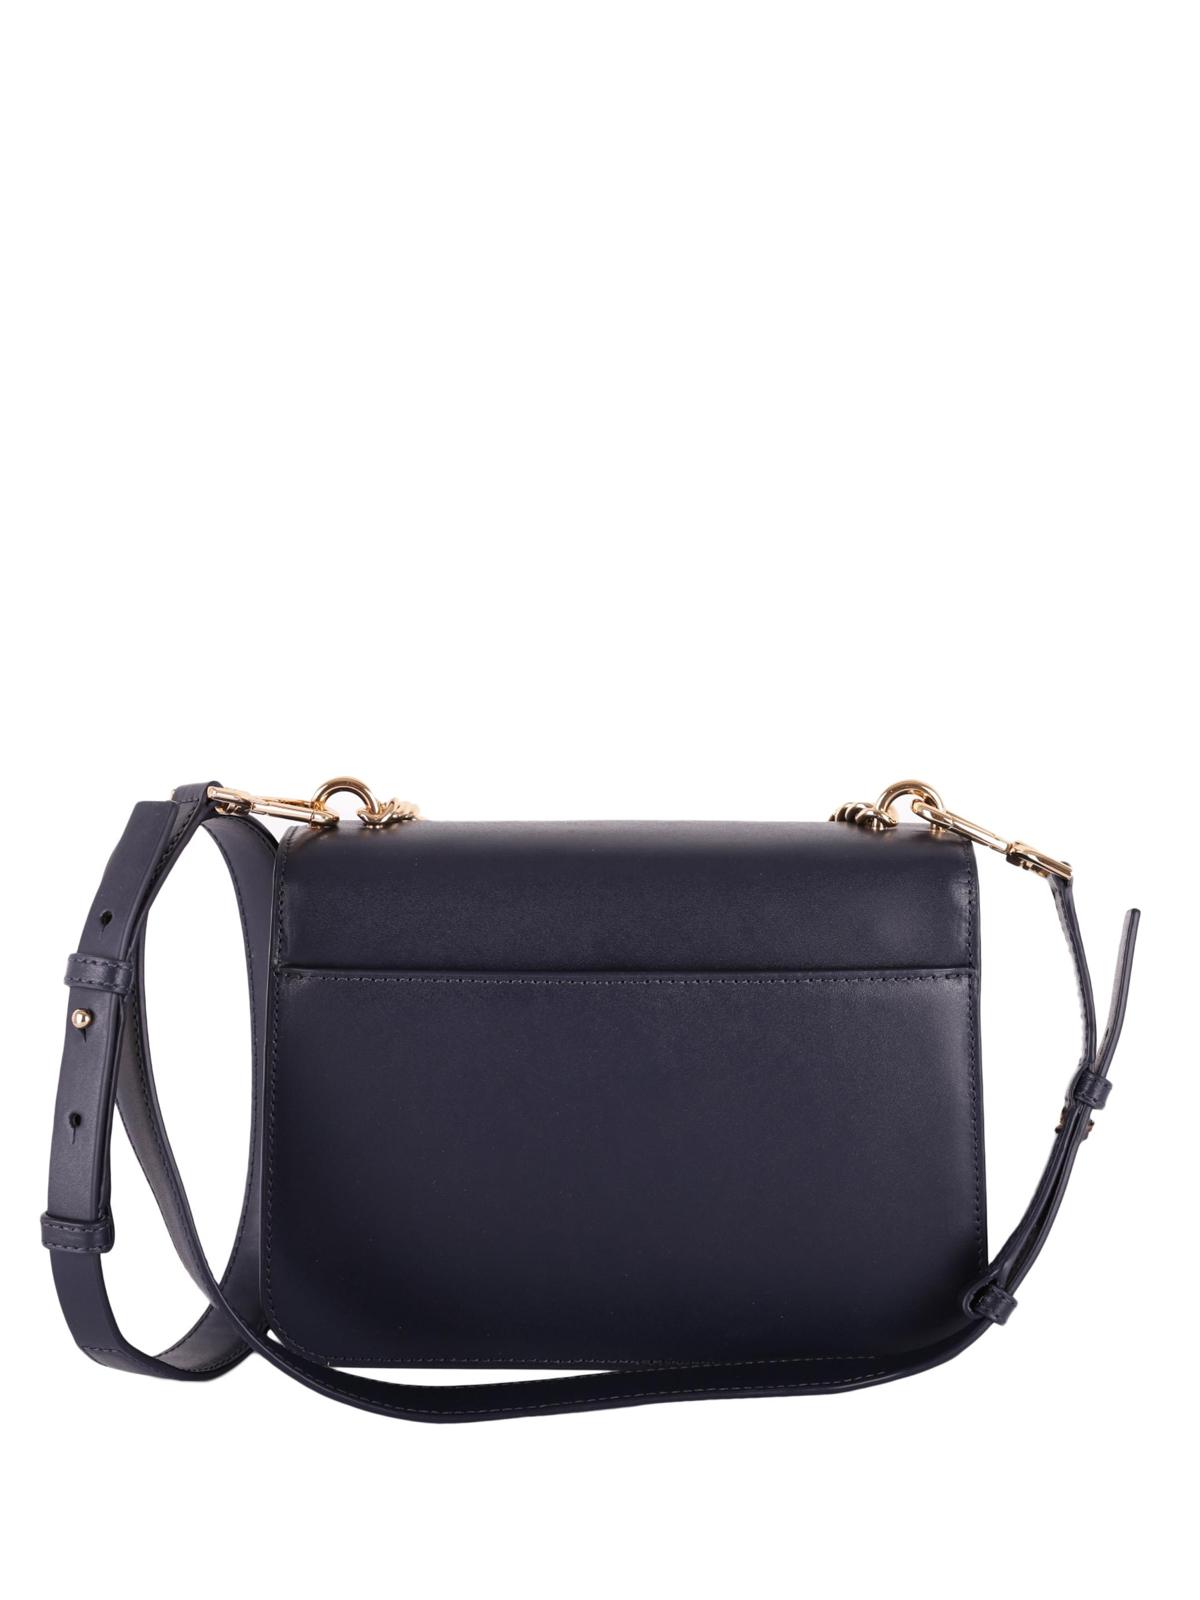 d8196a153ae8 iKRIX MICHAEL KORS: cross body bags - Mott blue leather cross body bag